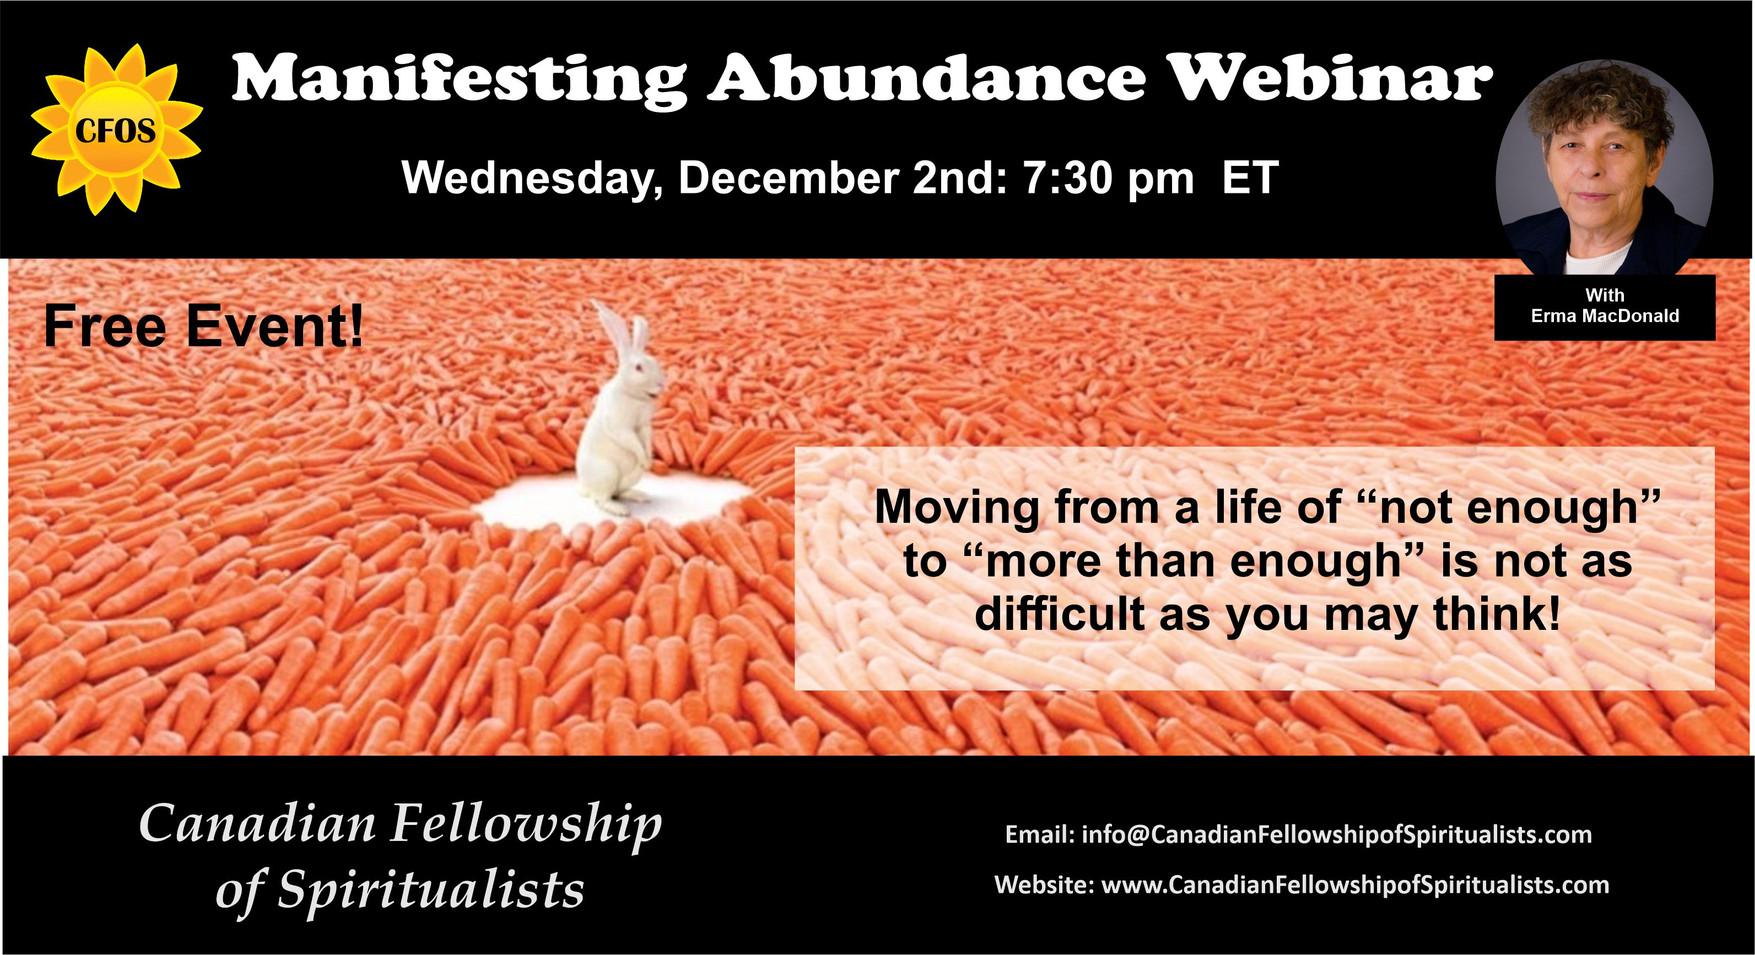 Manifesting Abundance Webinar